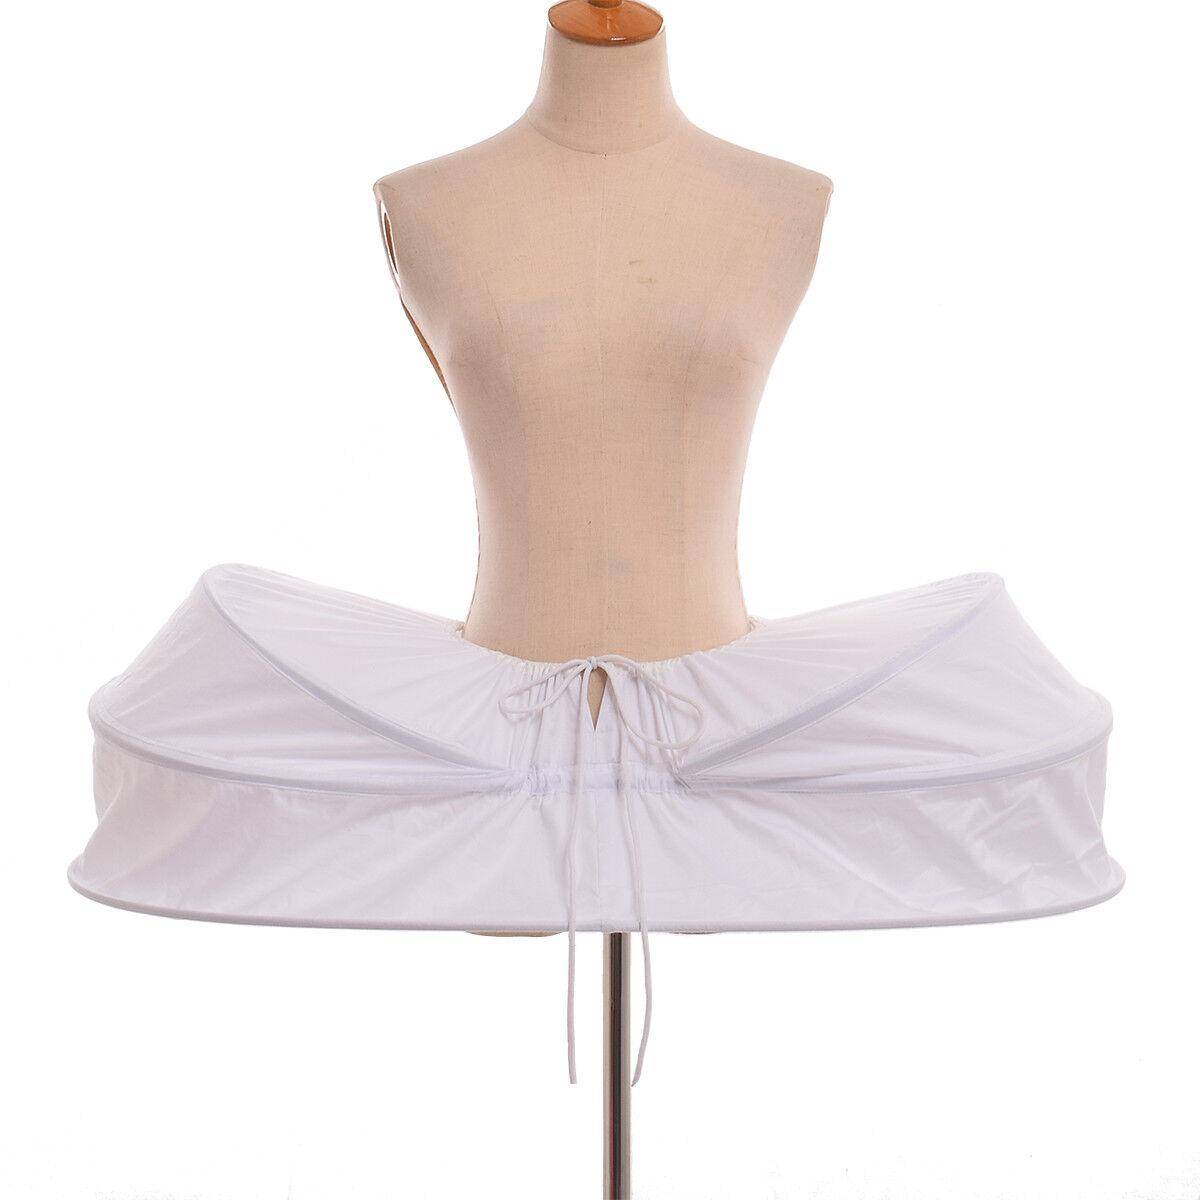 Fashion Elizabeth Crinoline Underskirt Hoop Skirt Pannier Bustle Petticoat